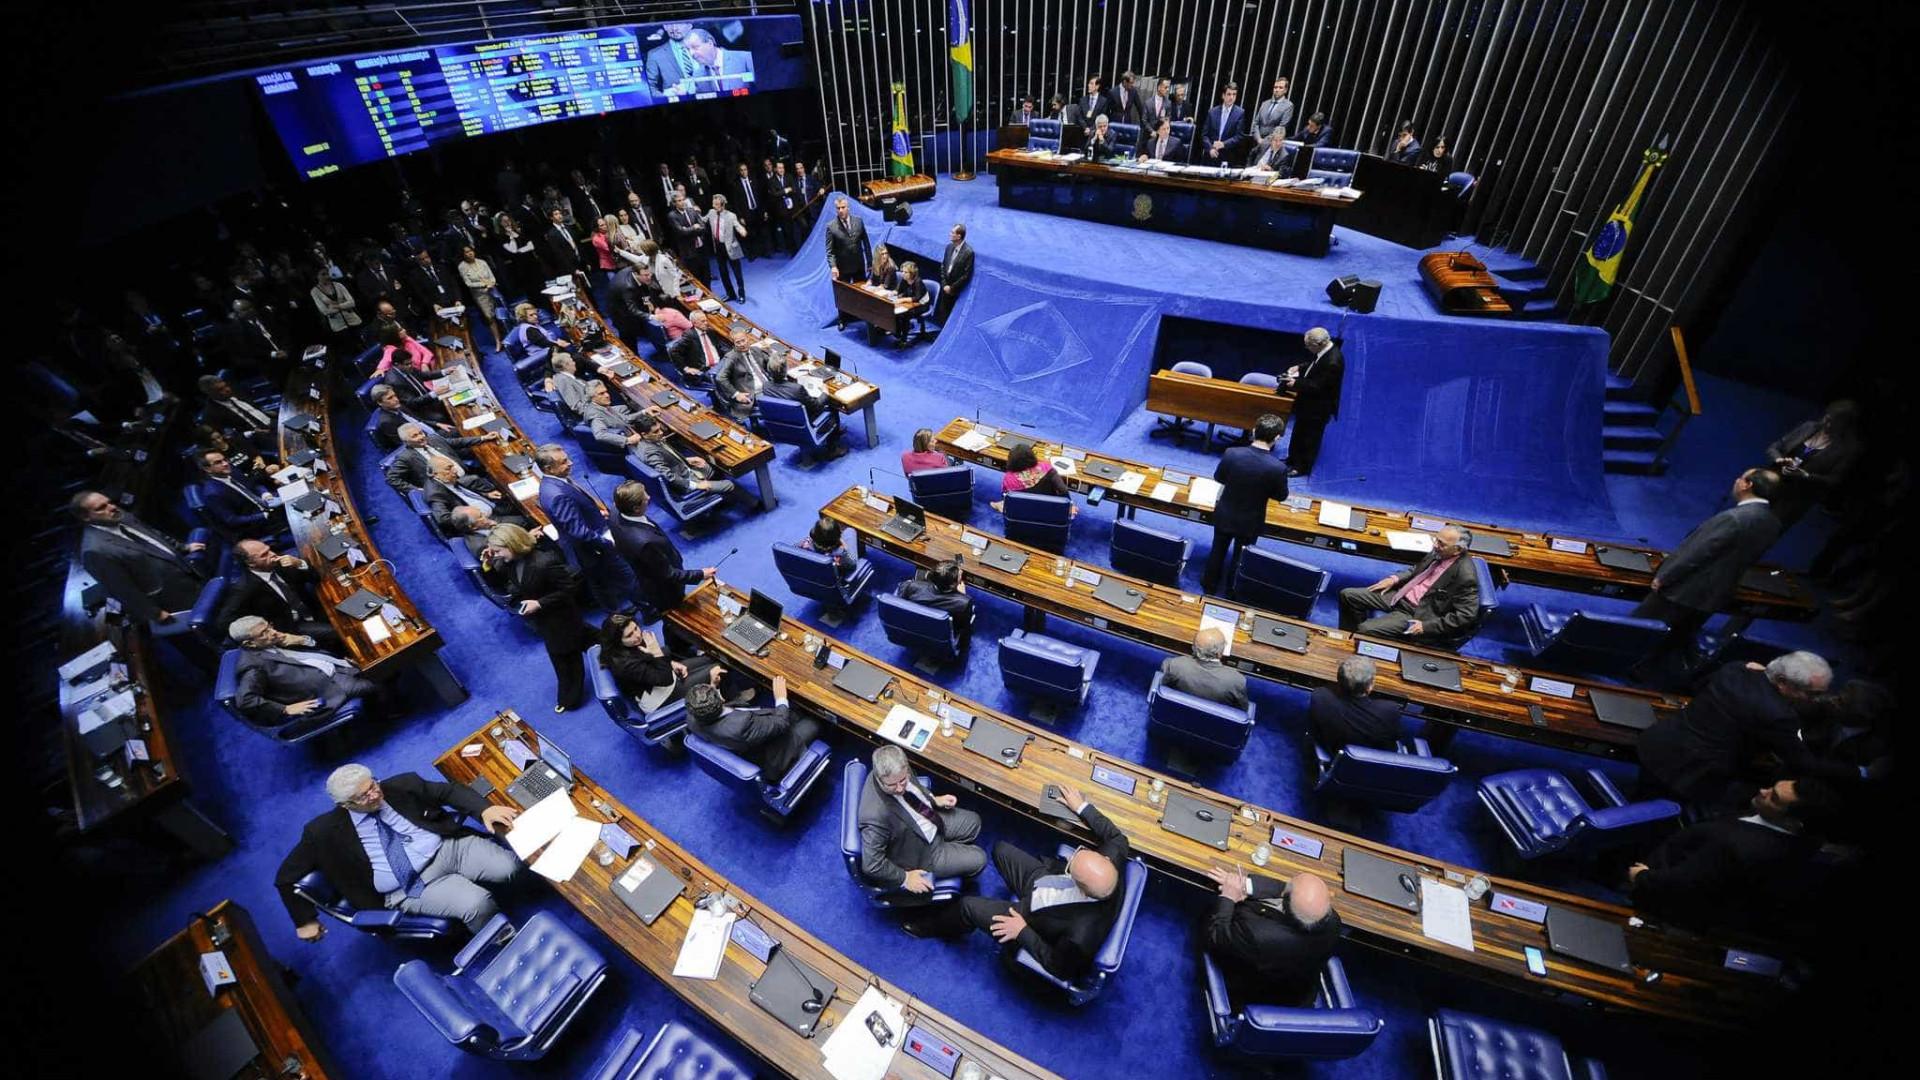 23 senadores investigados podem perder foro privilegiado este ano